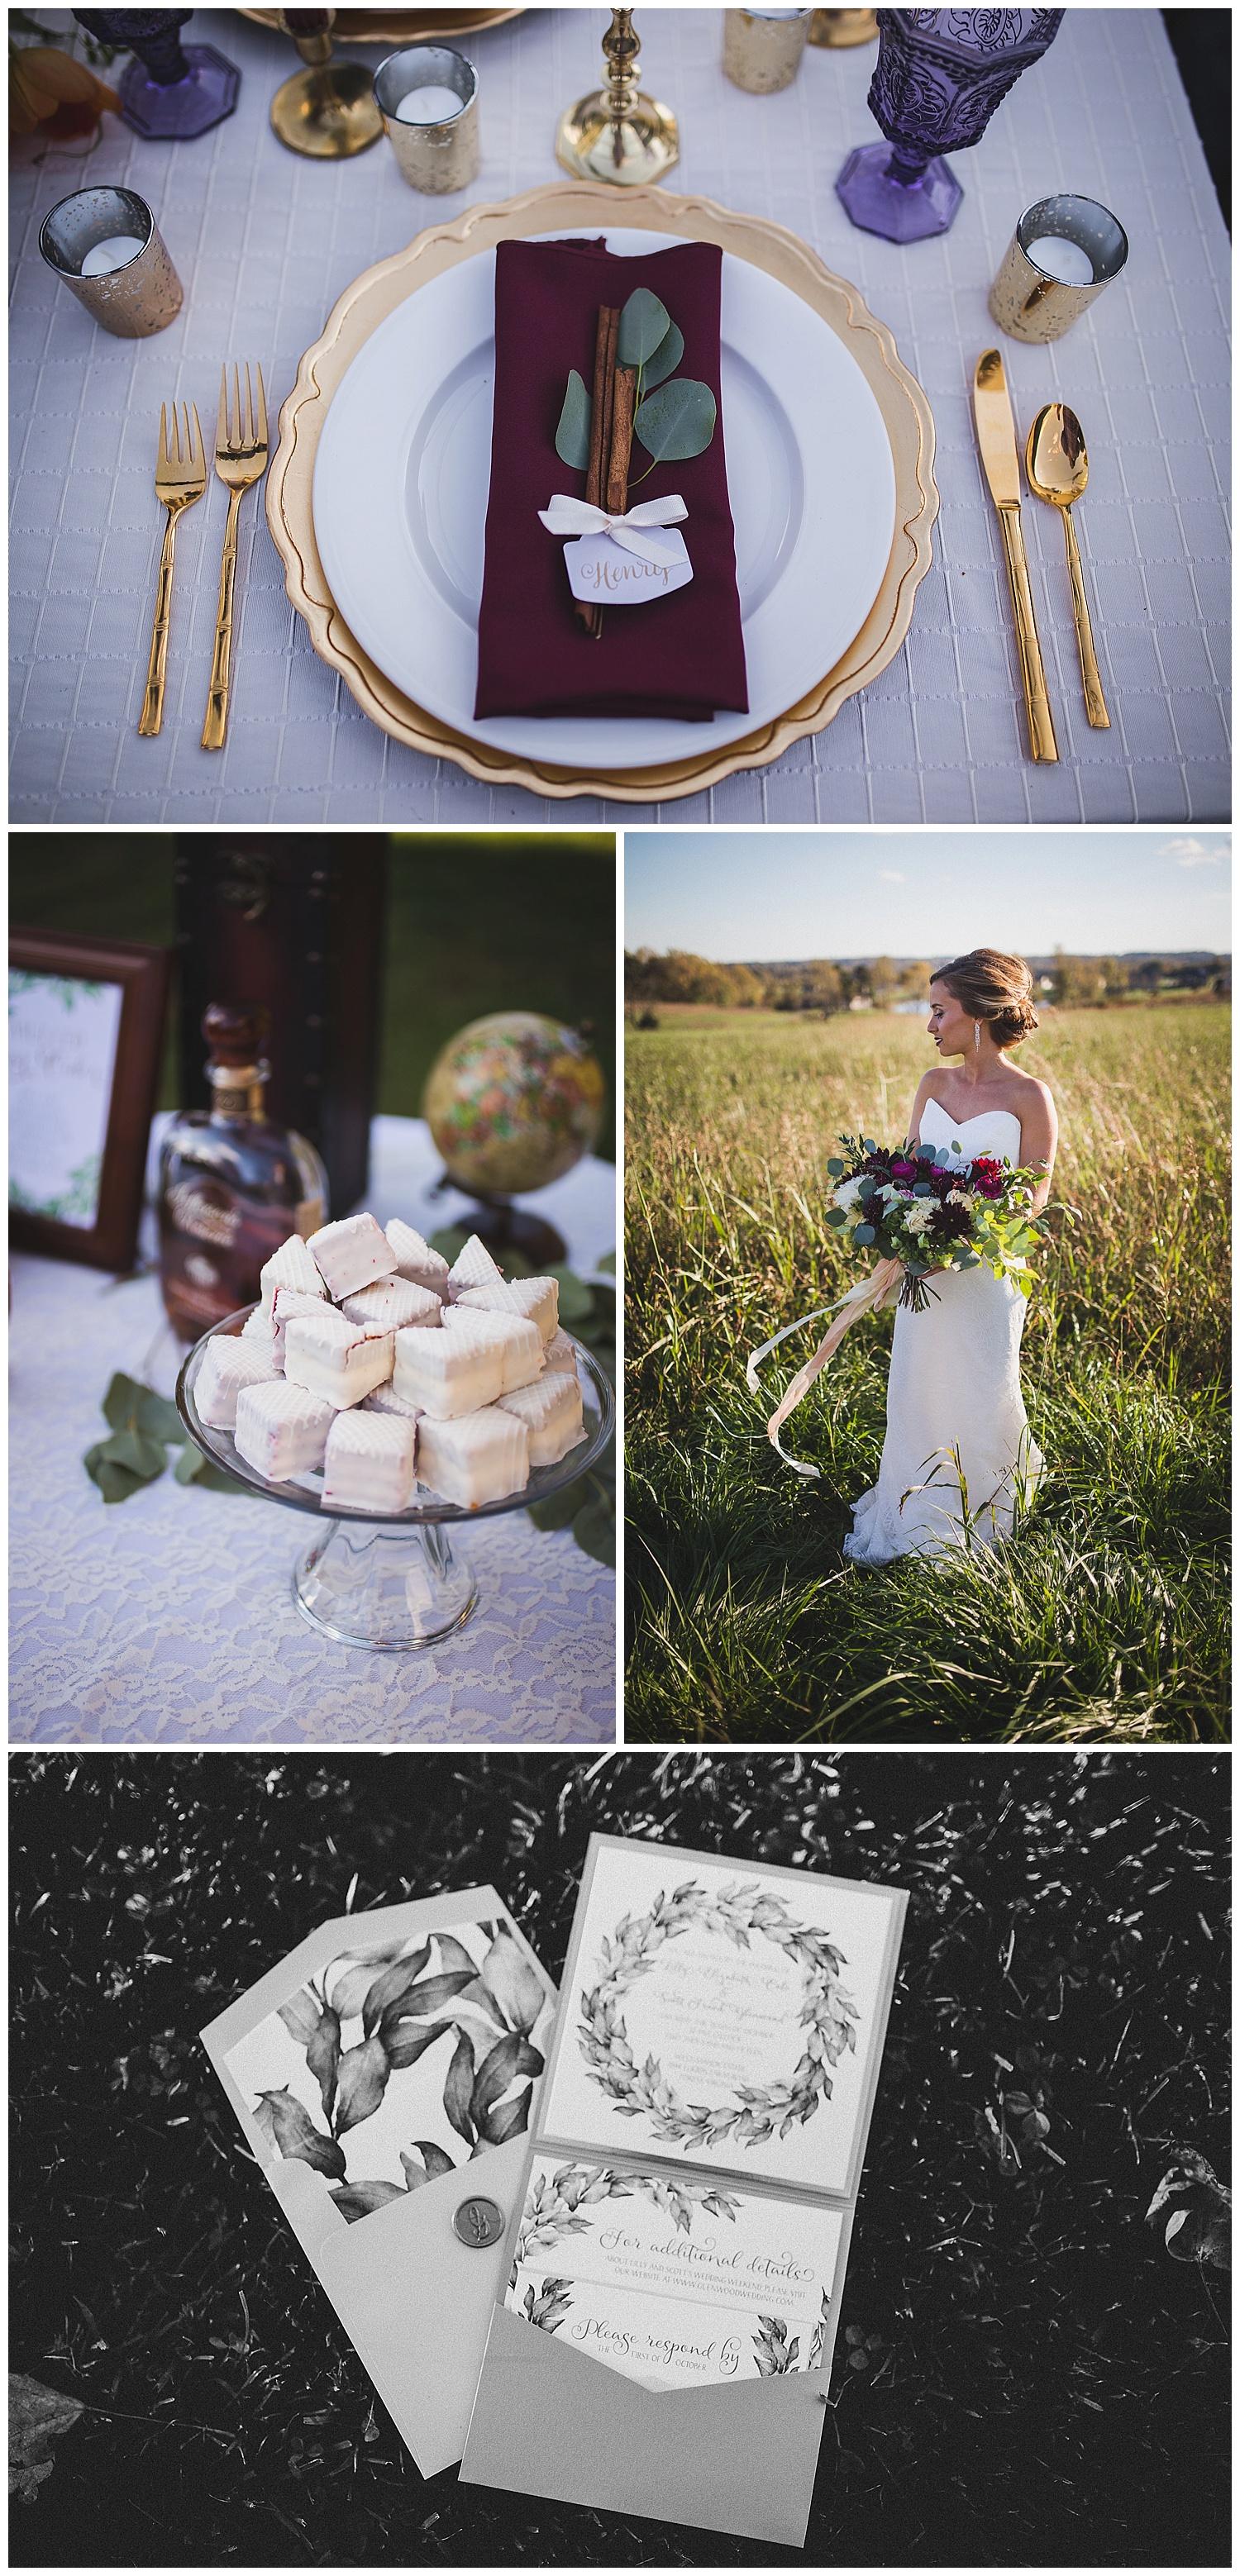 EmilyRogers-southwest-virginia-creative-wedding-photographer_0189.jpg